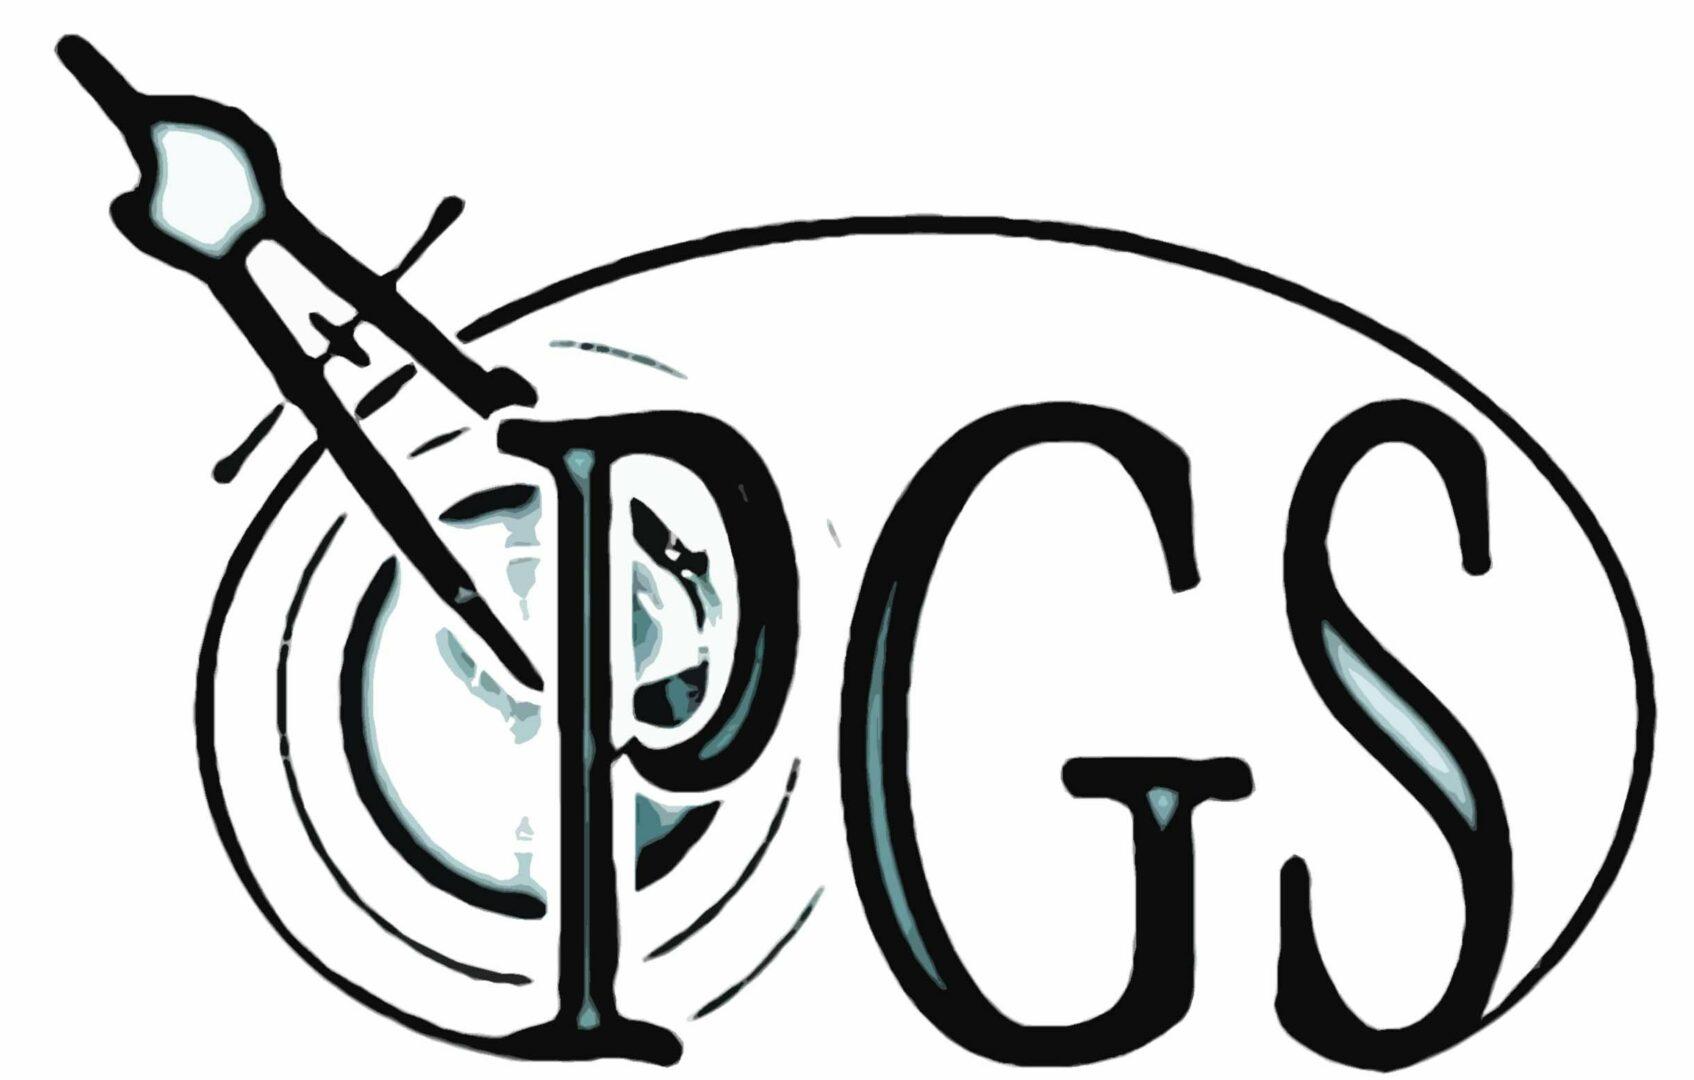 10aa4392-d8f6-449f-8836-b7ef56e6cfc8pgs logo_highres